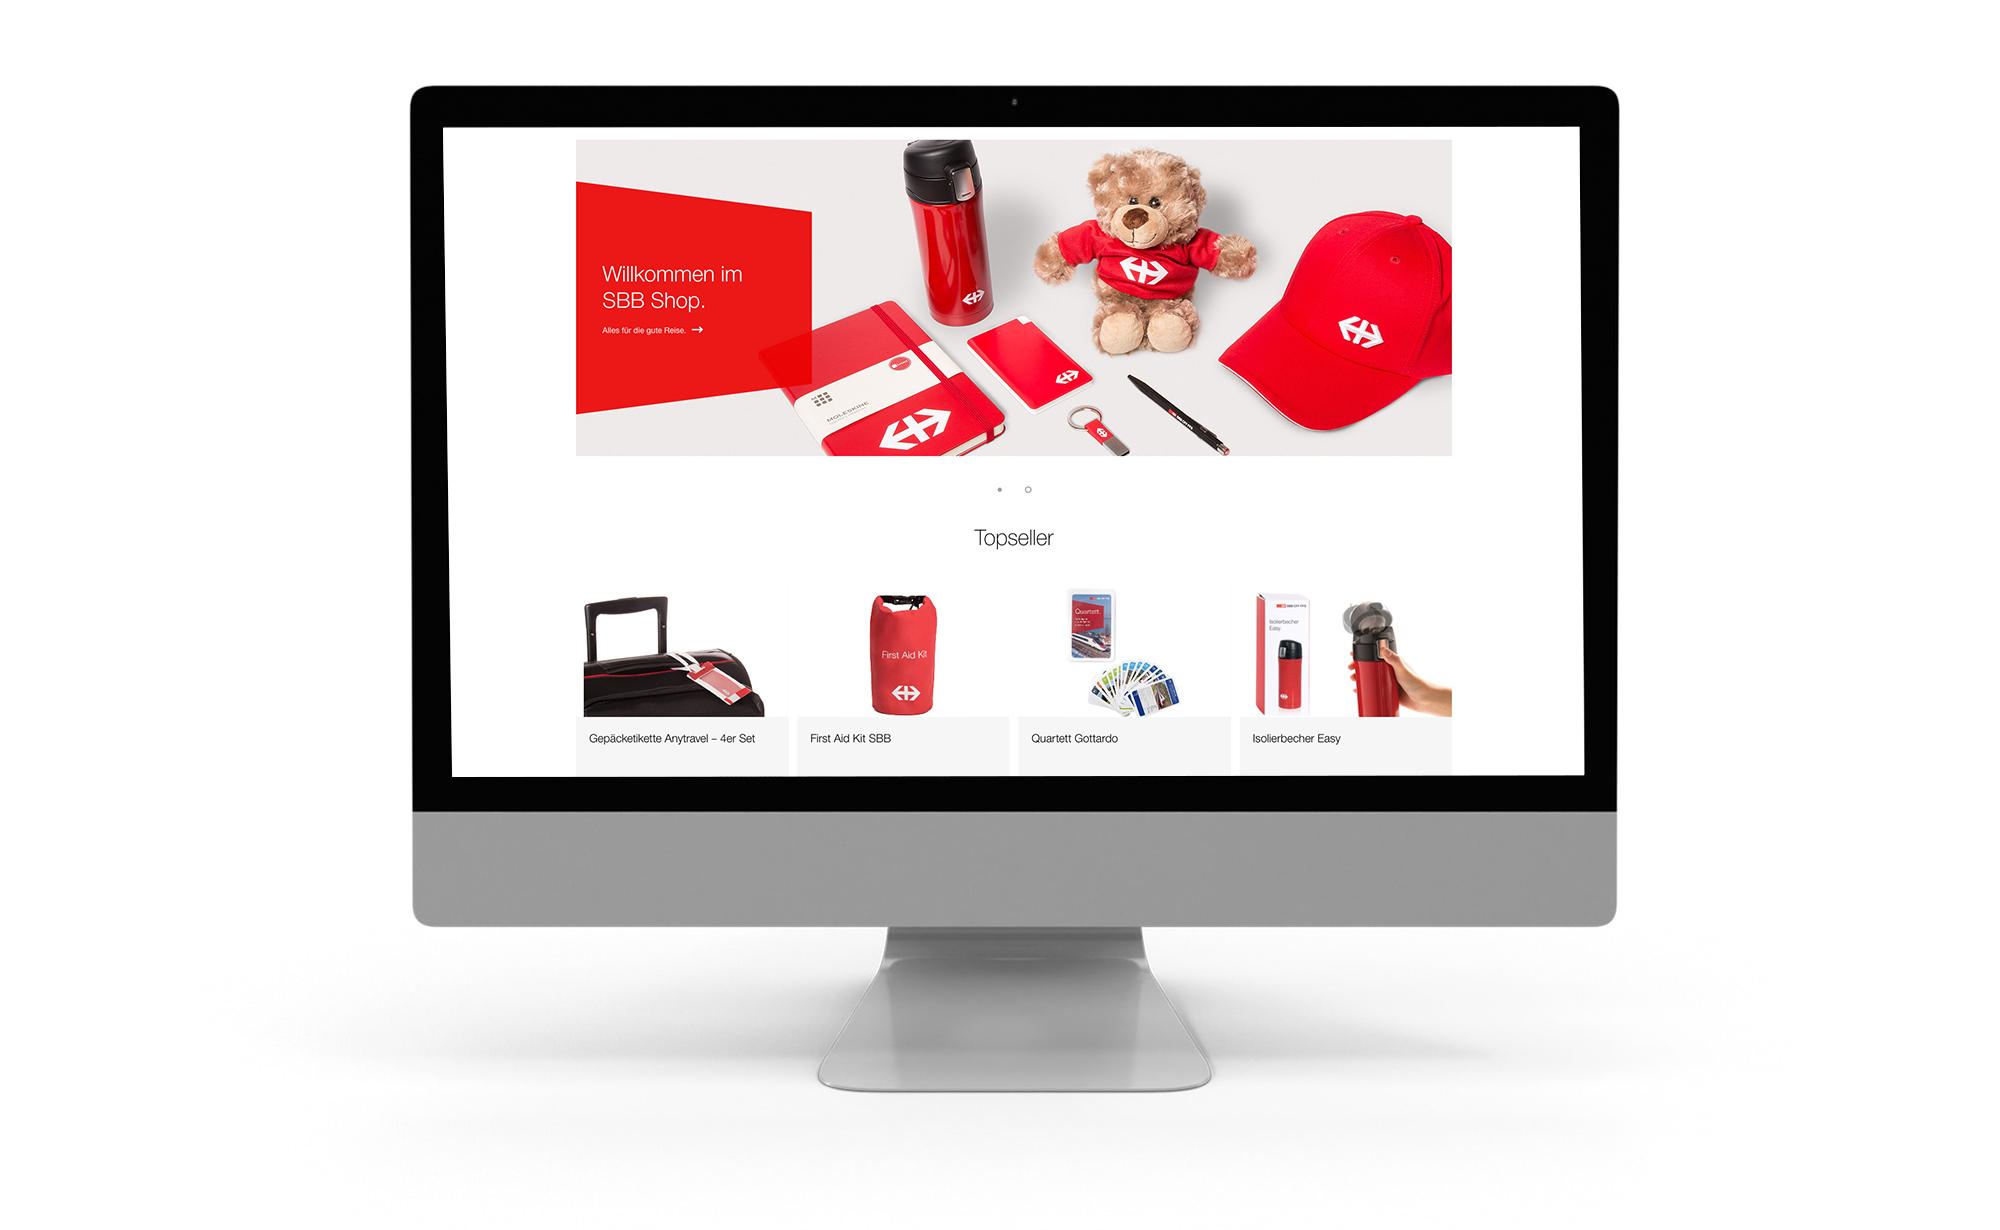 SBB Desktop version